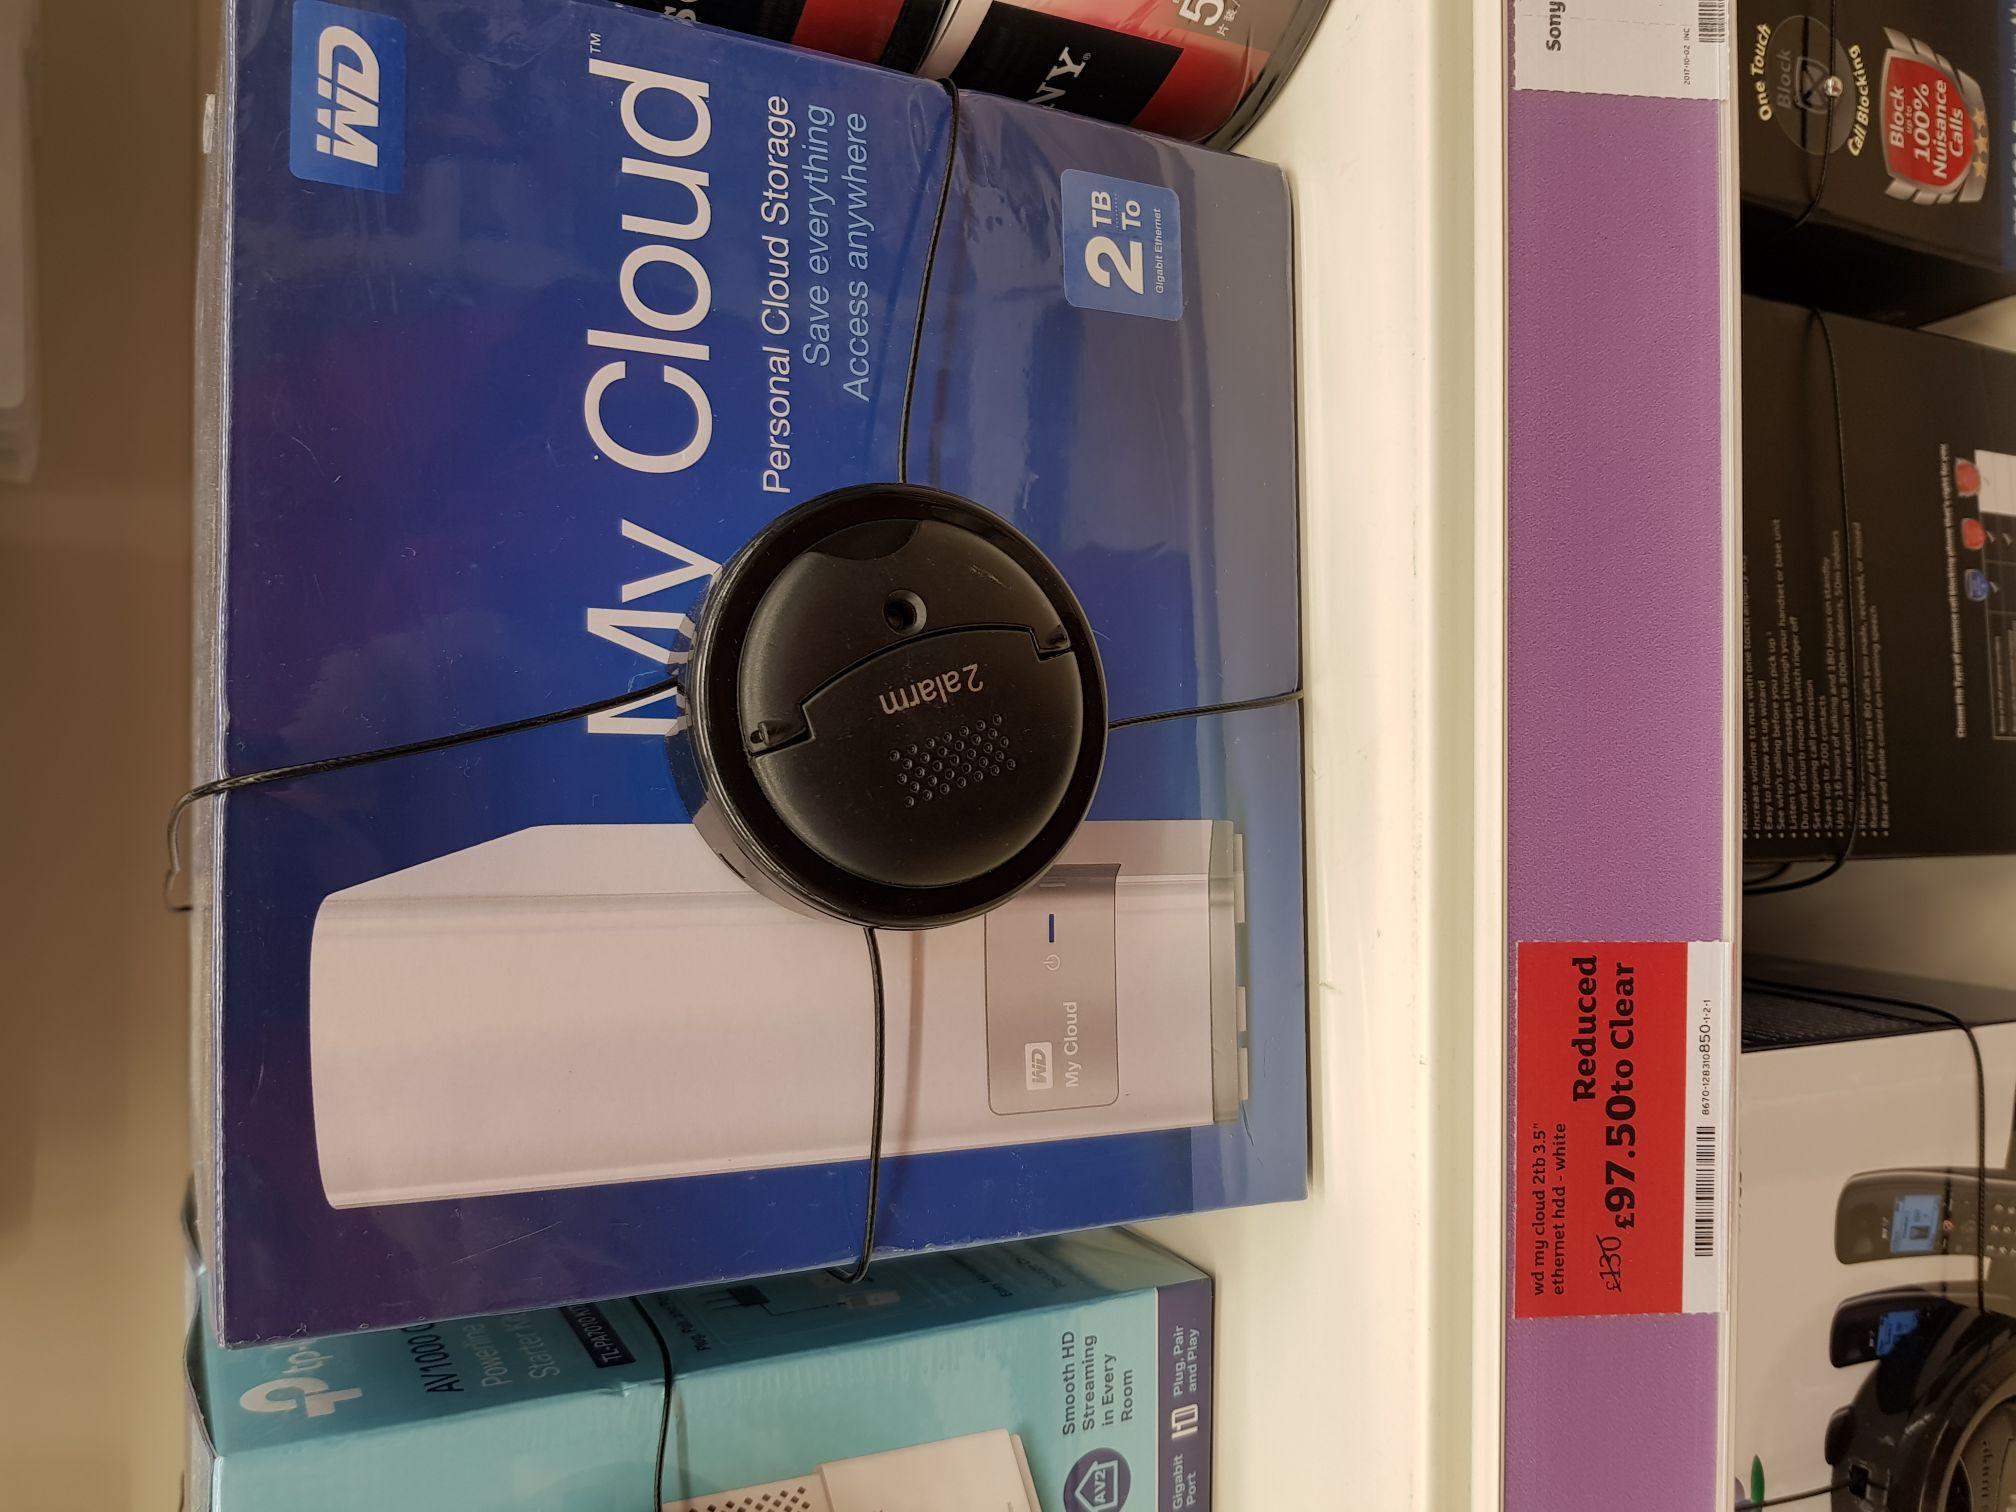 Wd Mycloud 2Tb hardrive £97.50 - Sainsburys instore